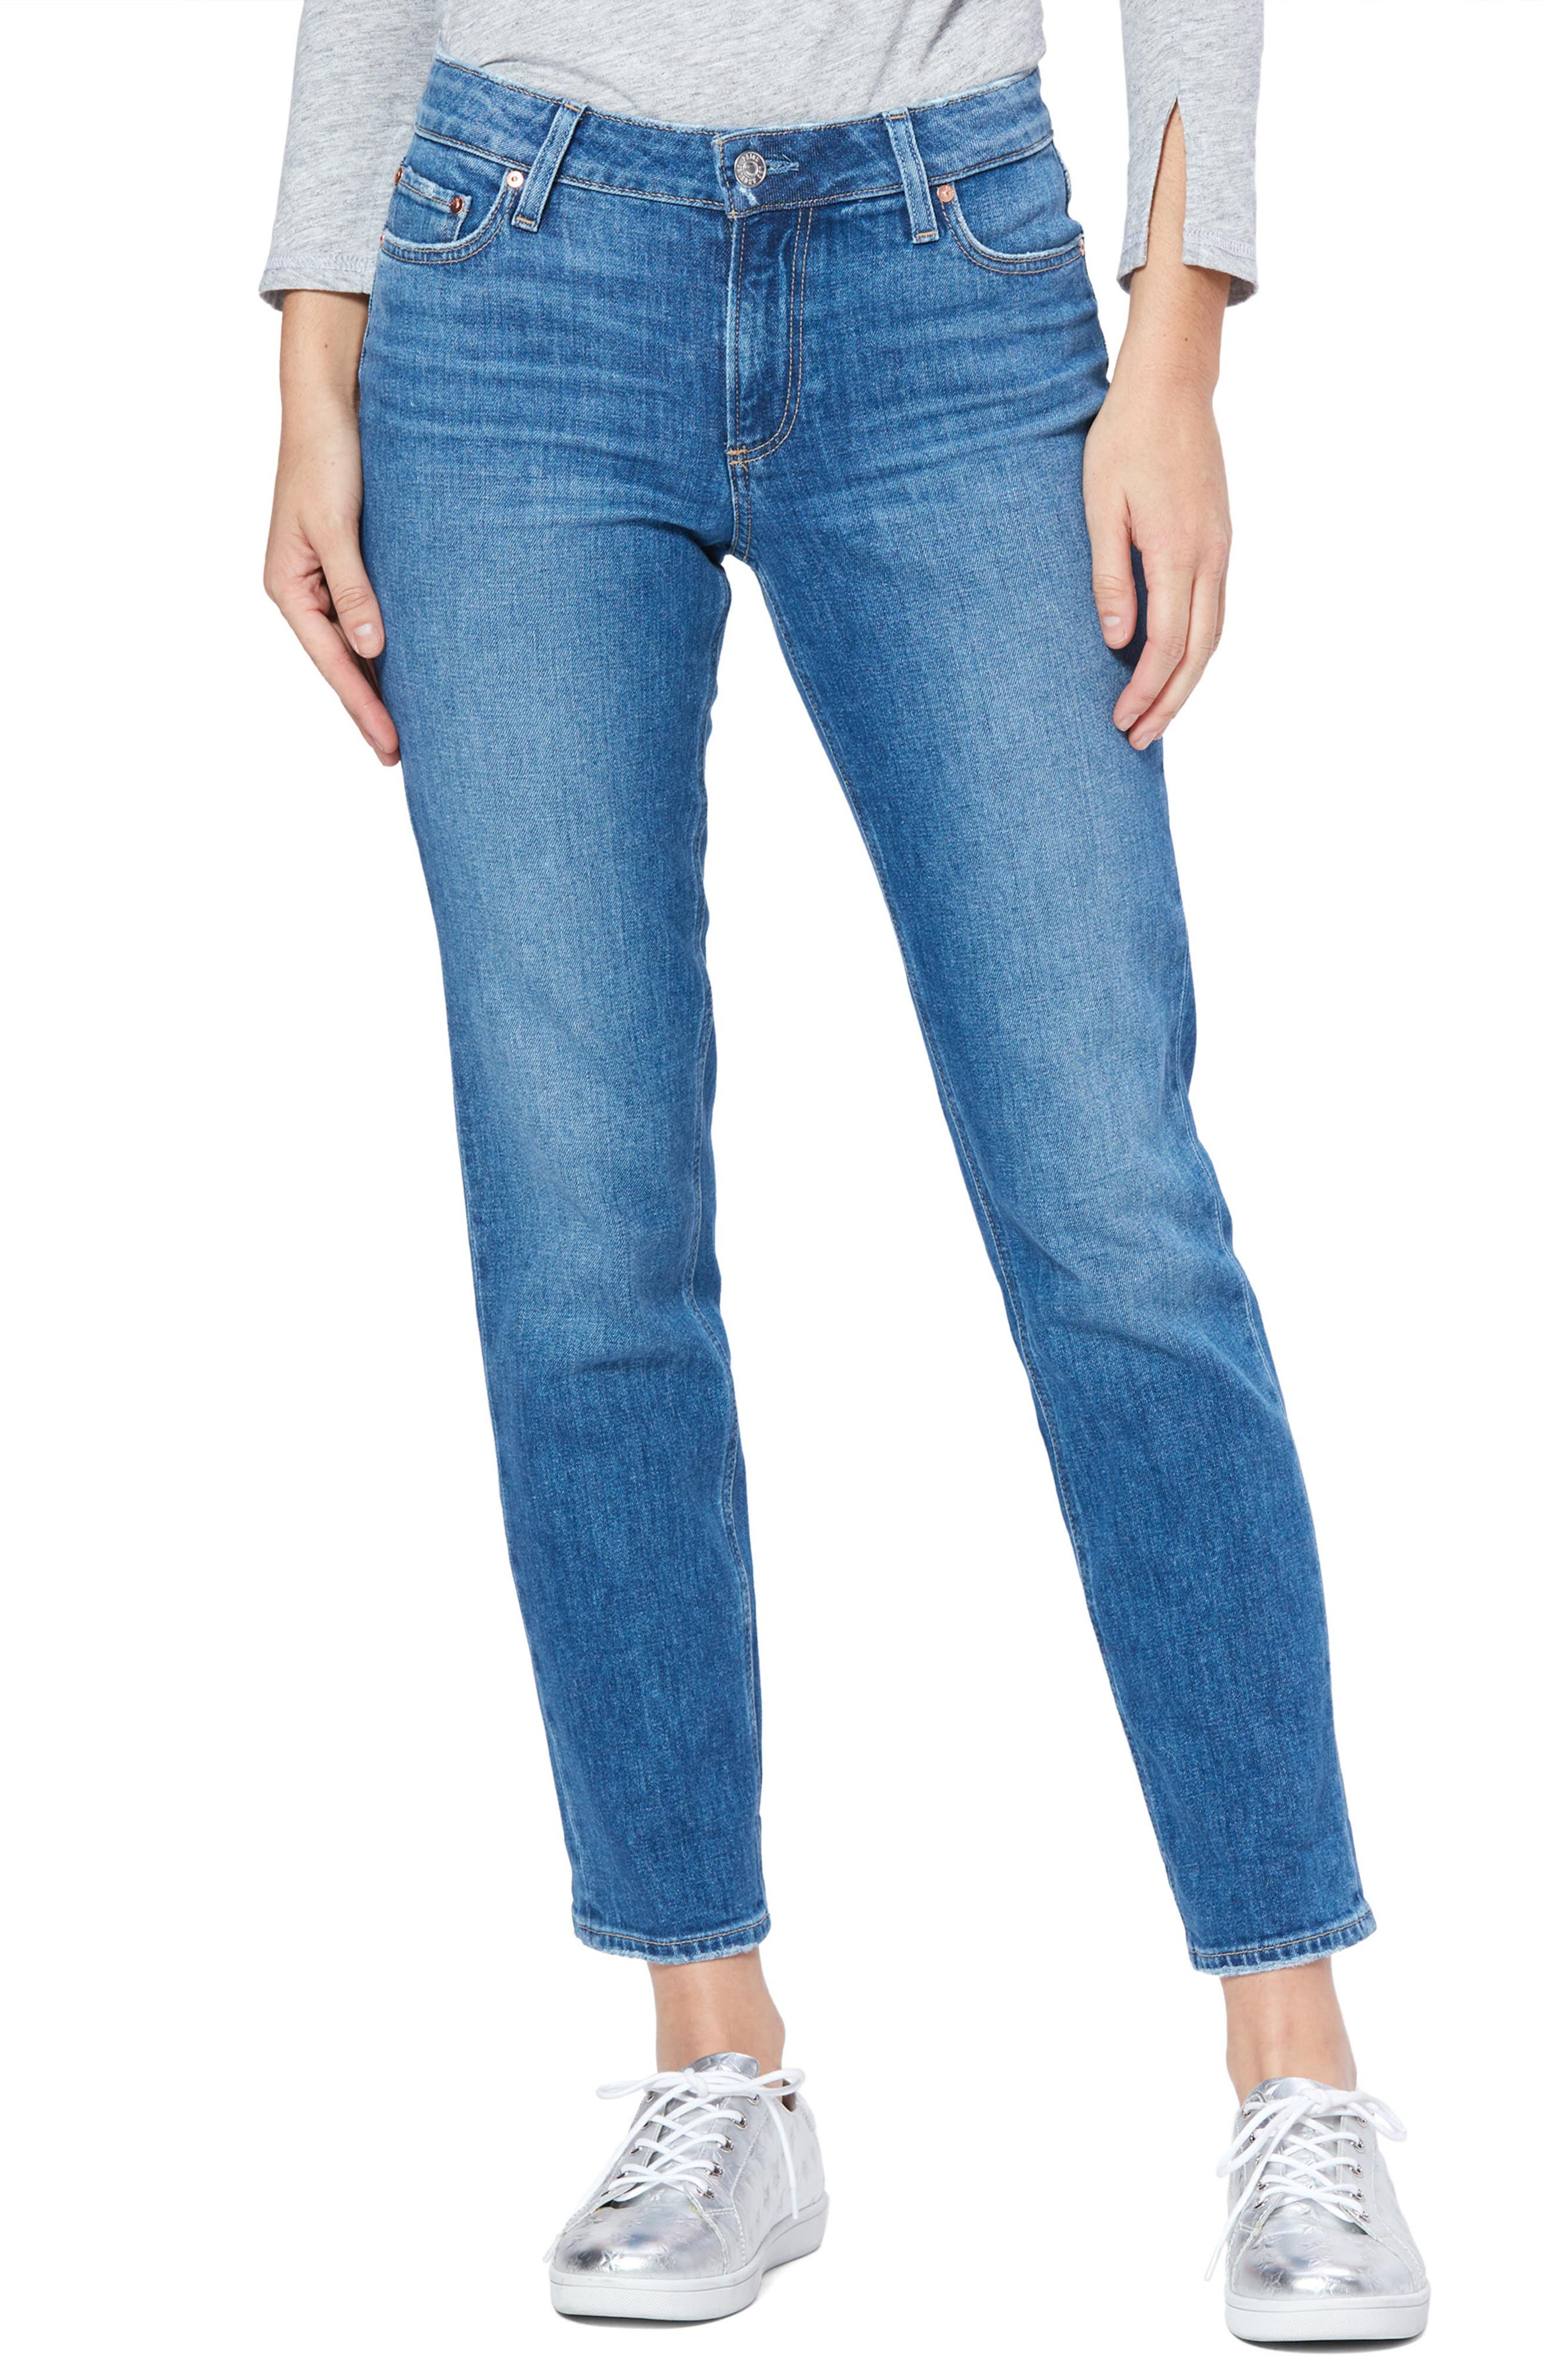 PAIGE Vintage - Brigitte High Waist Ankle Boyfriend Jeans (Trail)